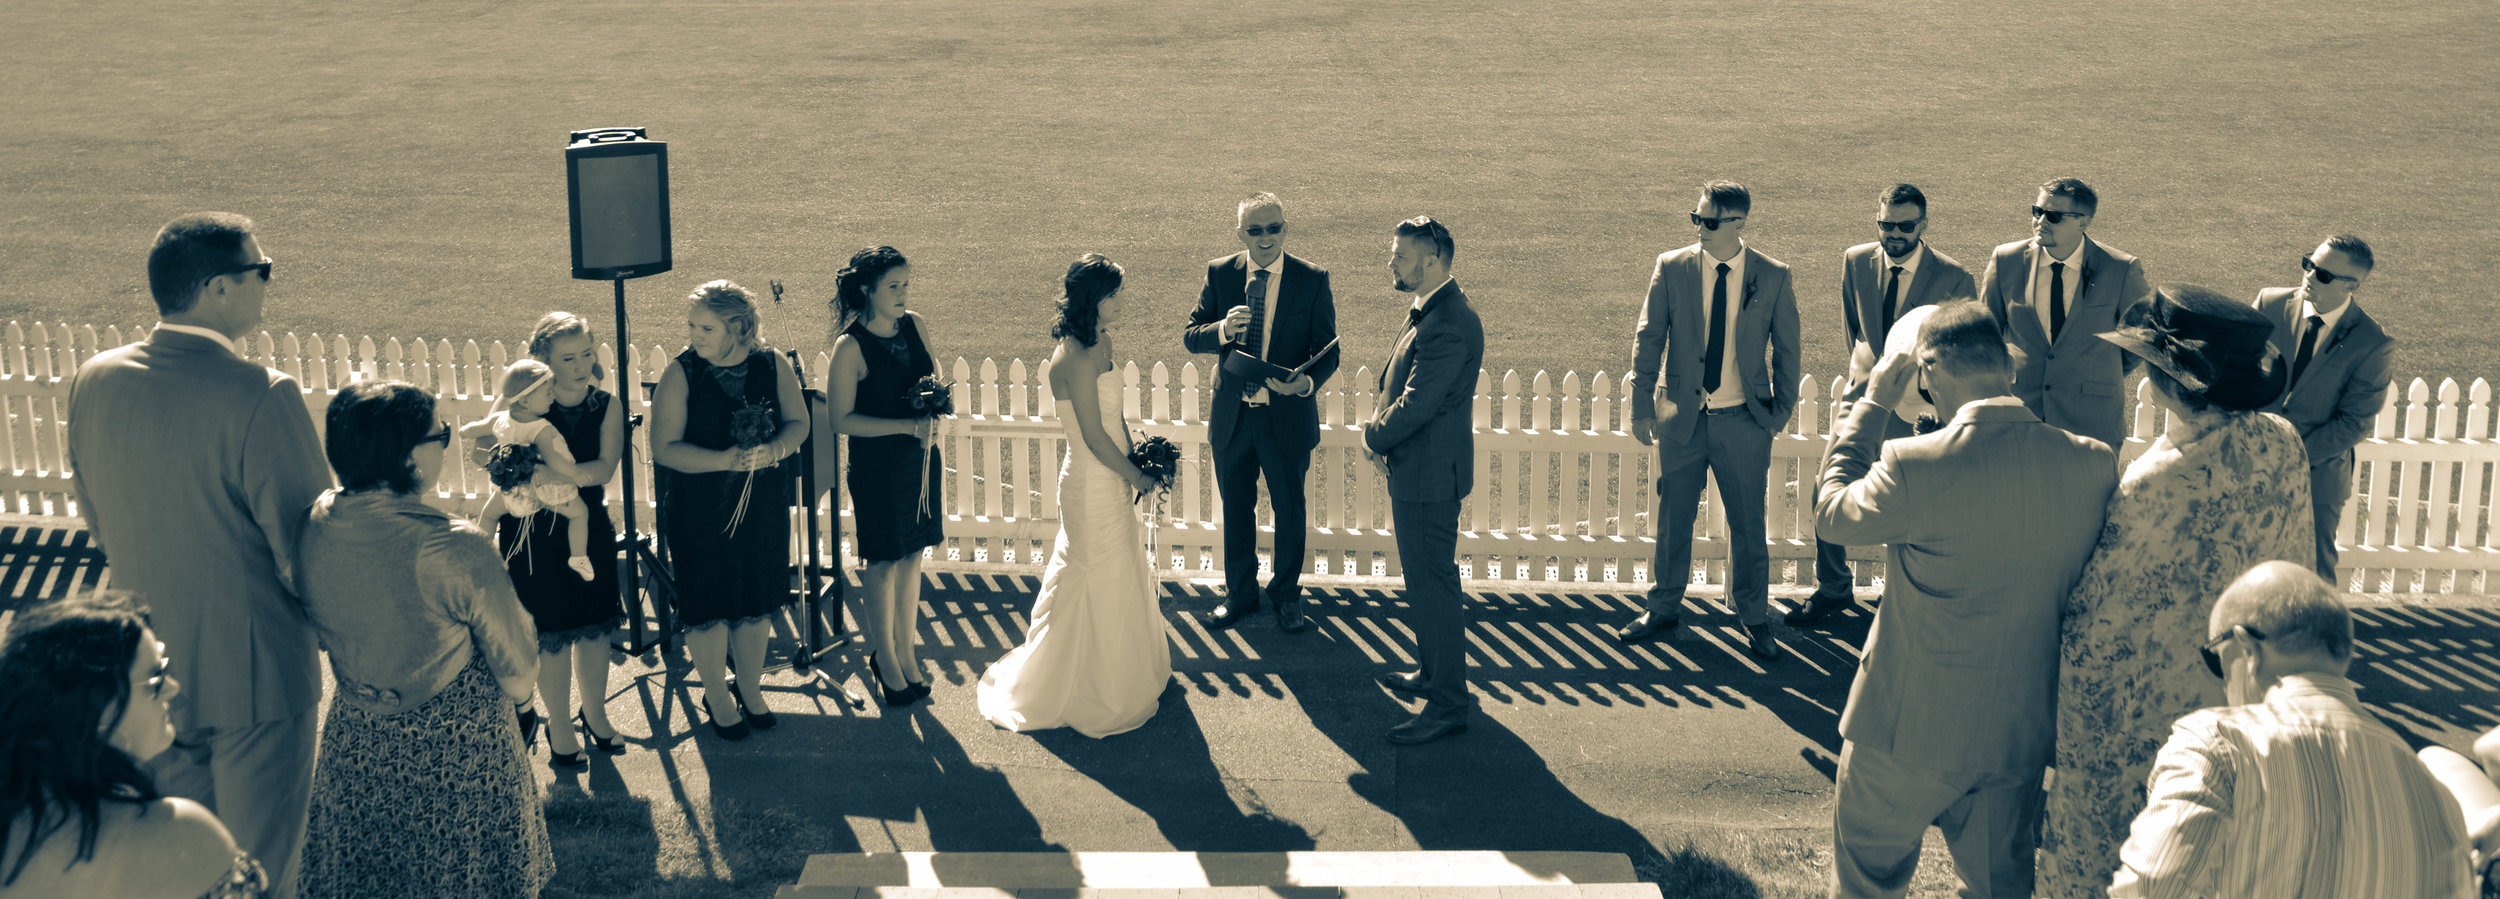 wedding sandh-61.jpg